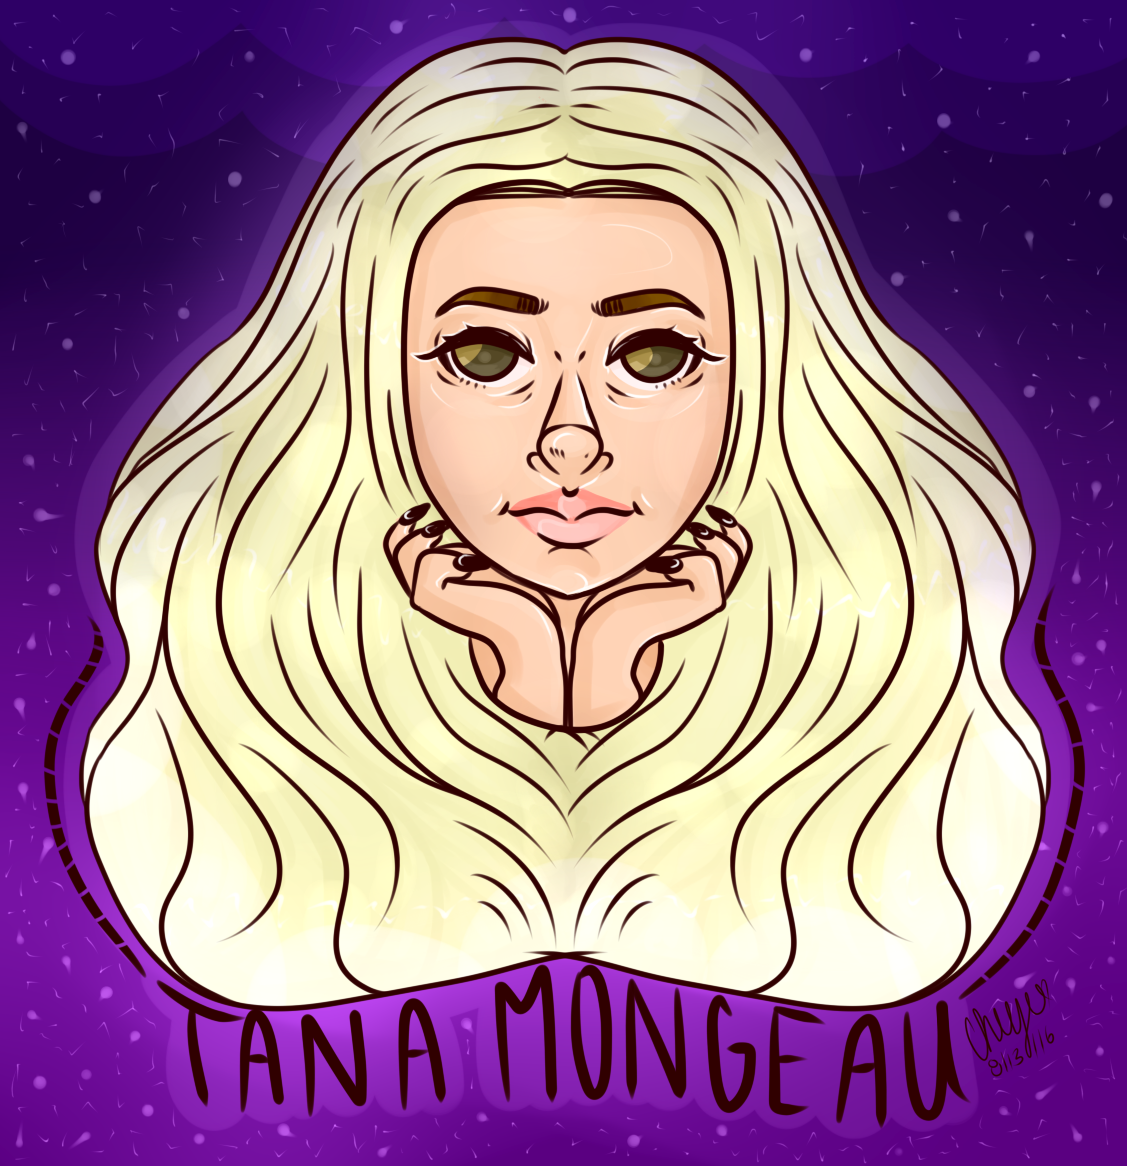 tana mongeaus hair.png